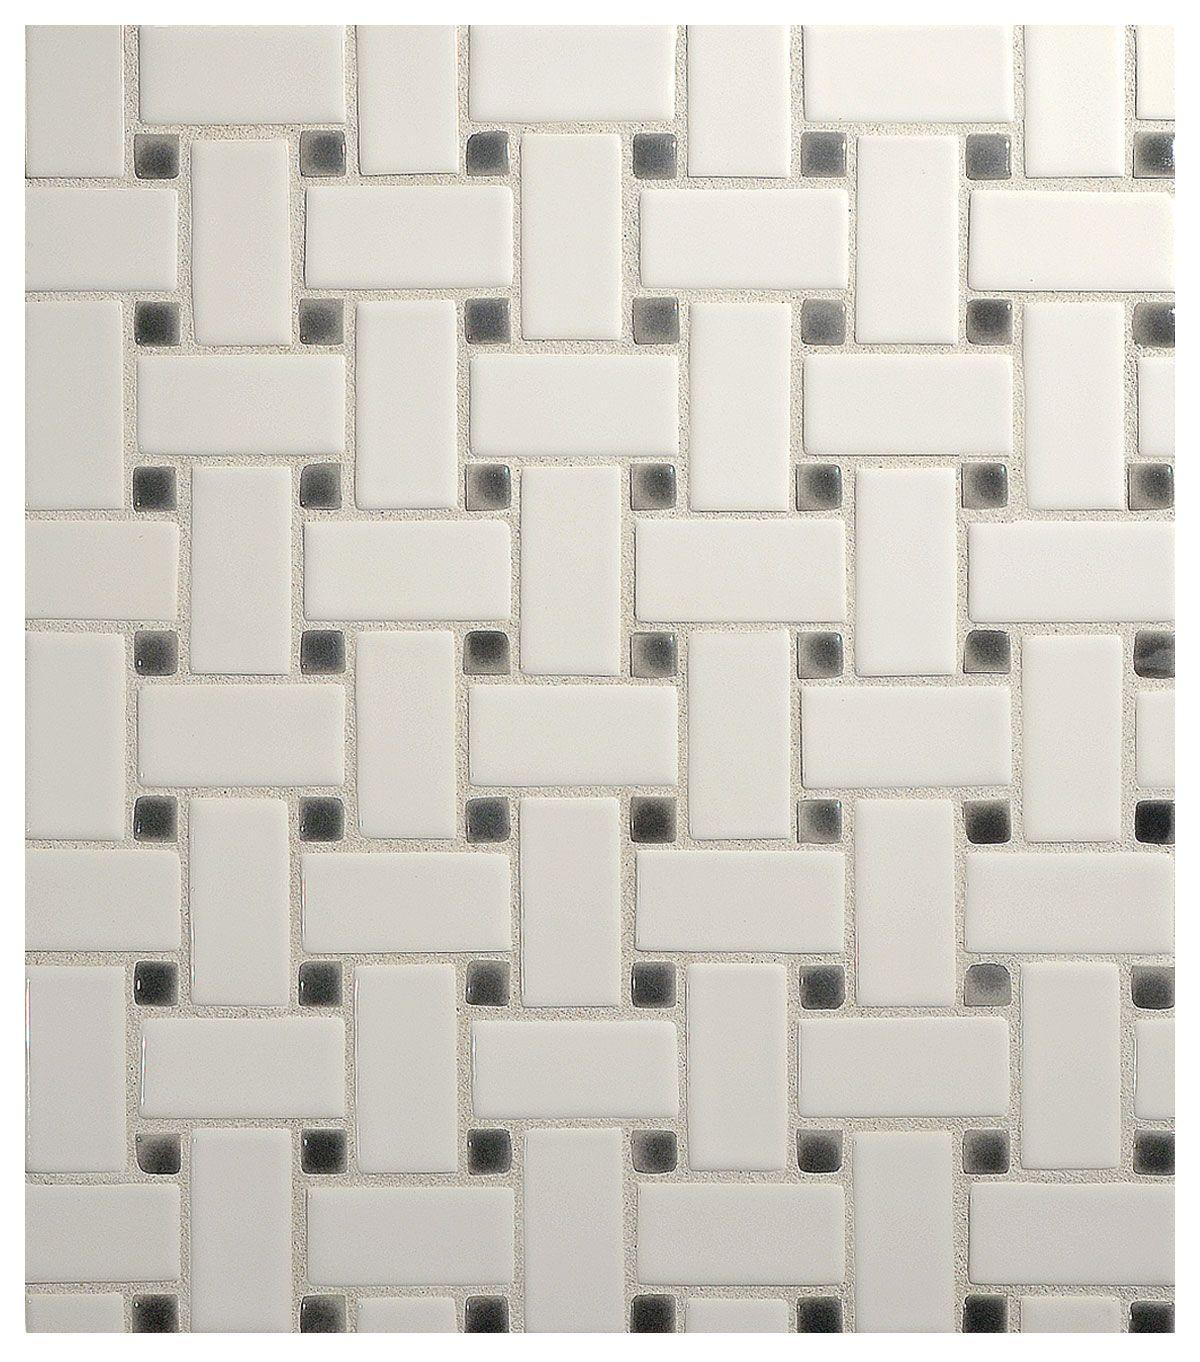 Vermeere ceramic mosaic basketweave gloss tile pinterest complete tile collection vermeere ceramic mosaic basketweave gloss ceramic mosaic tile mi color true white with charcoal grey dots doublecrazyfo Choice Image